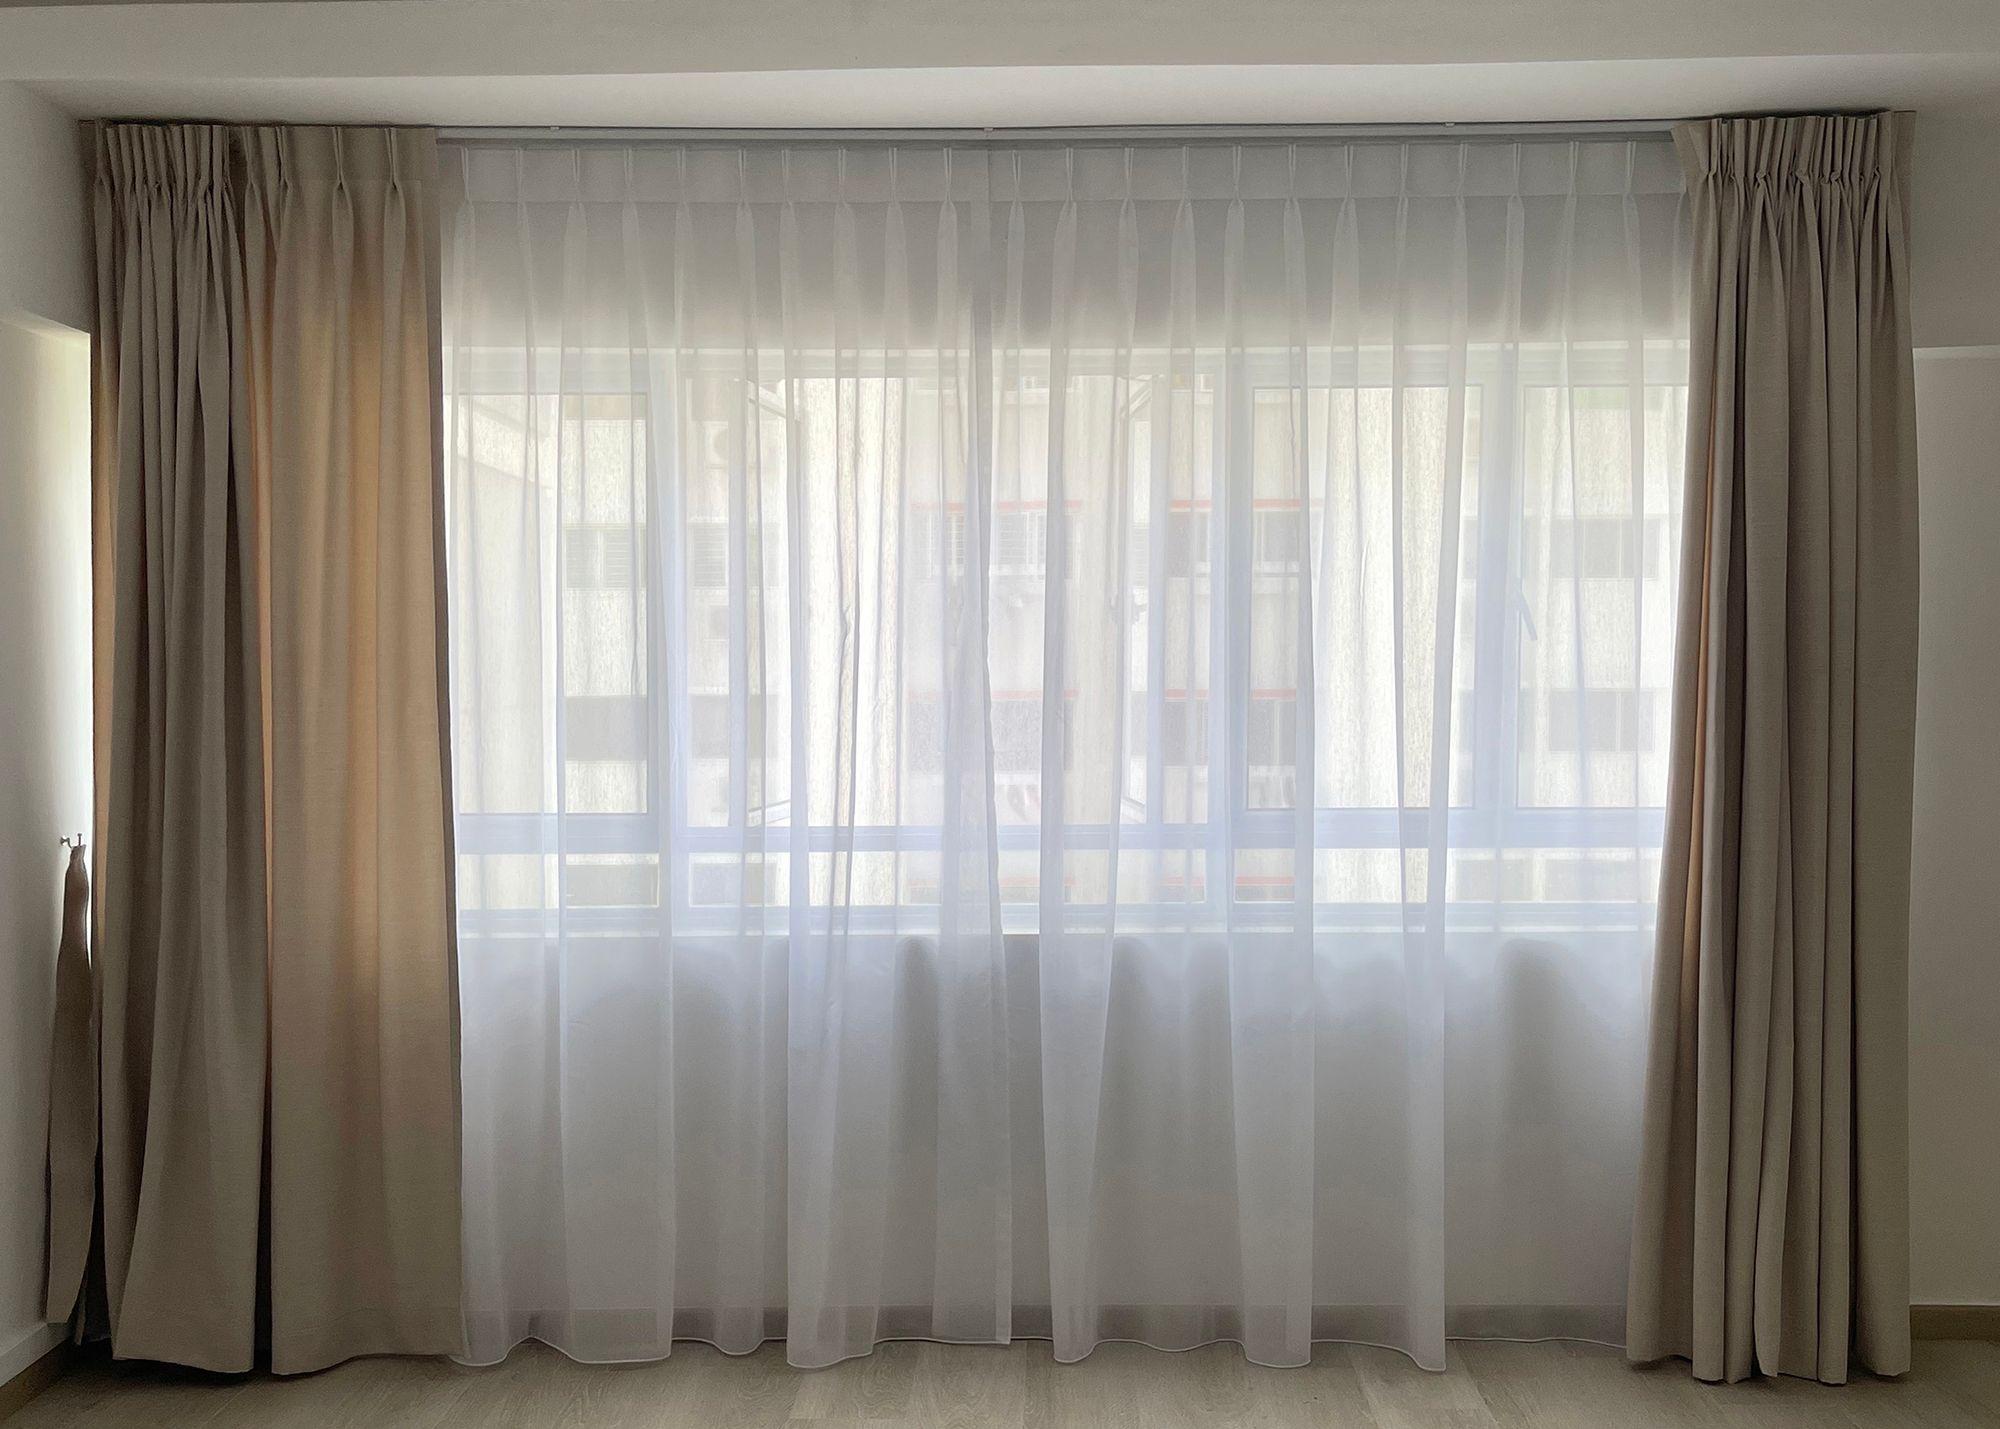 HDB Bedroom Day Night Curtains